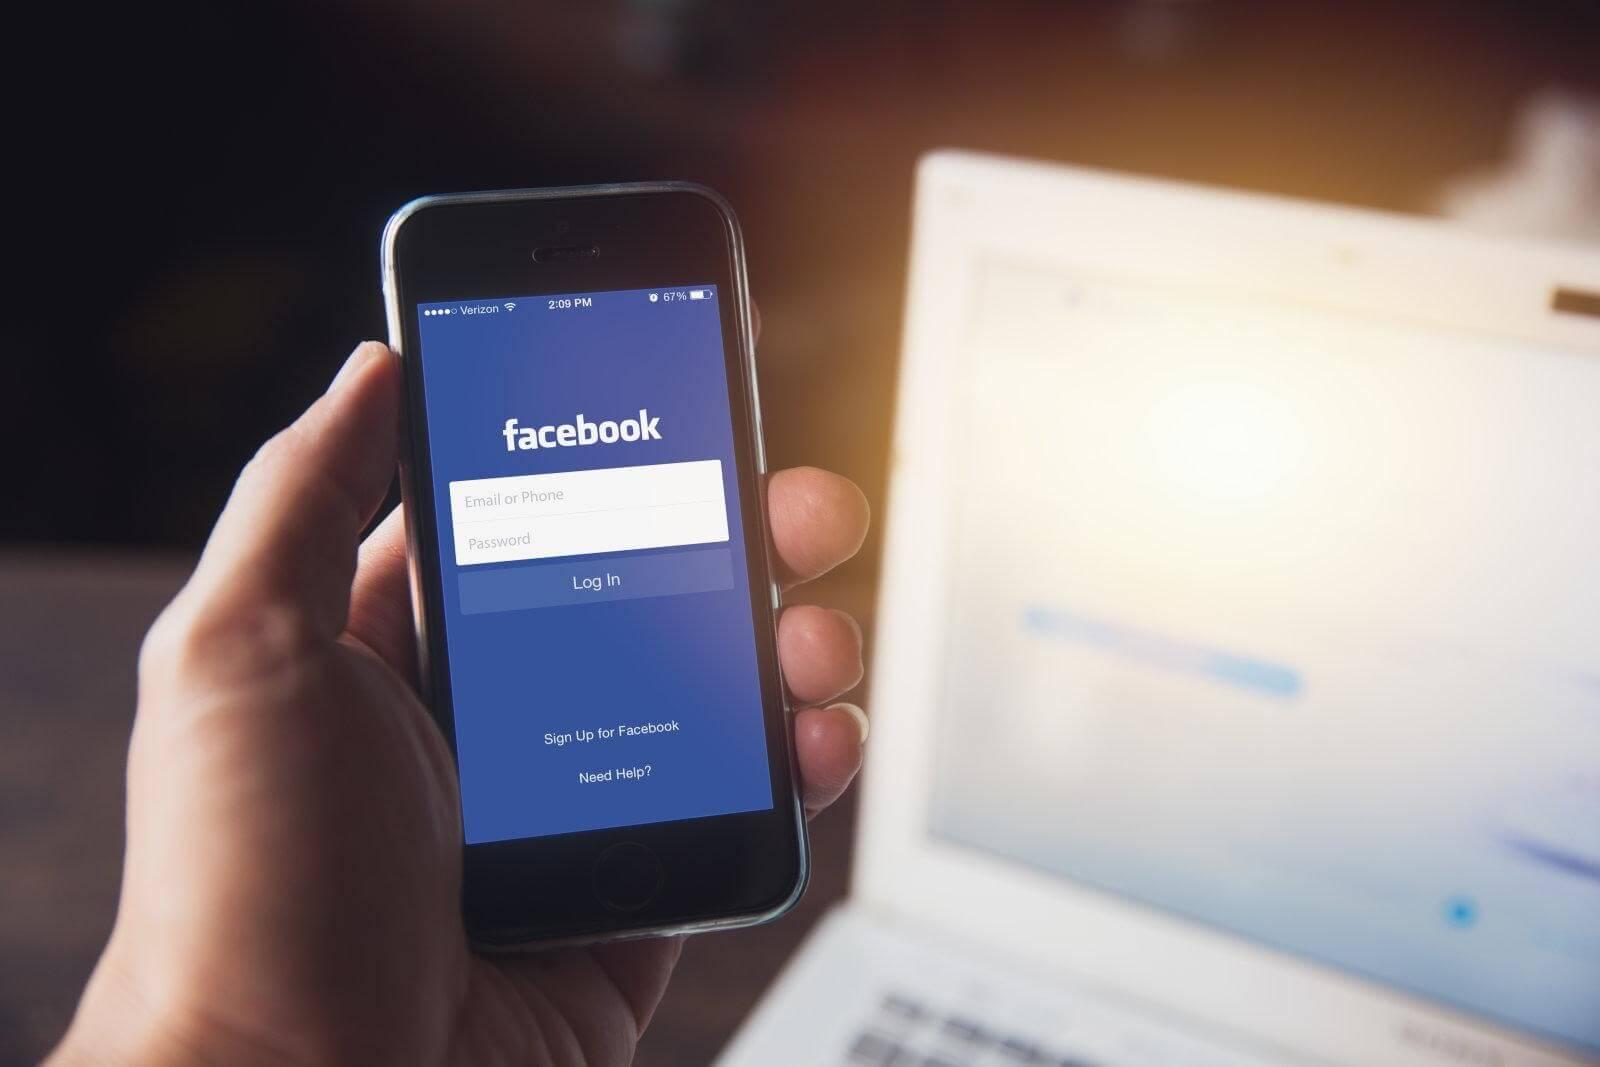 Facebook-Tests-Lite-App-for-iOS-Older-and-Slower-Phones